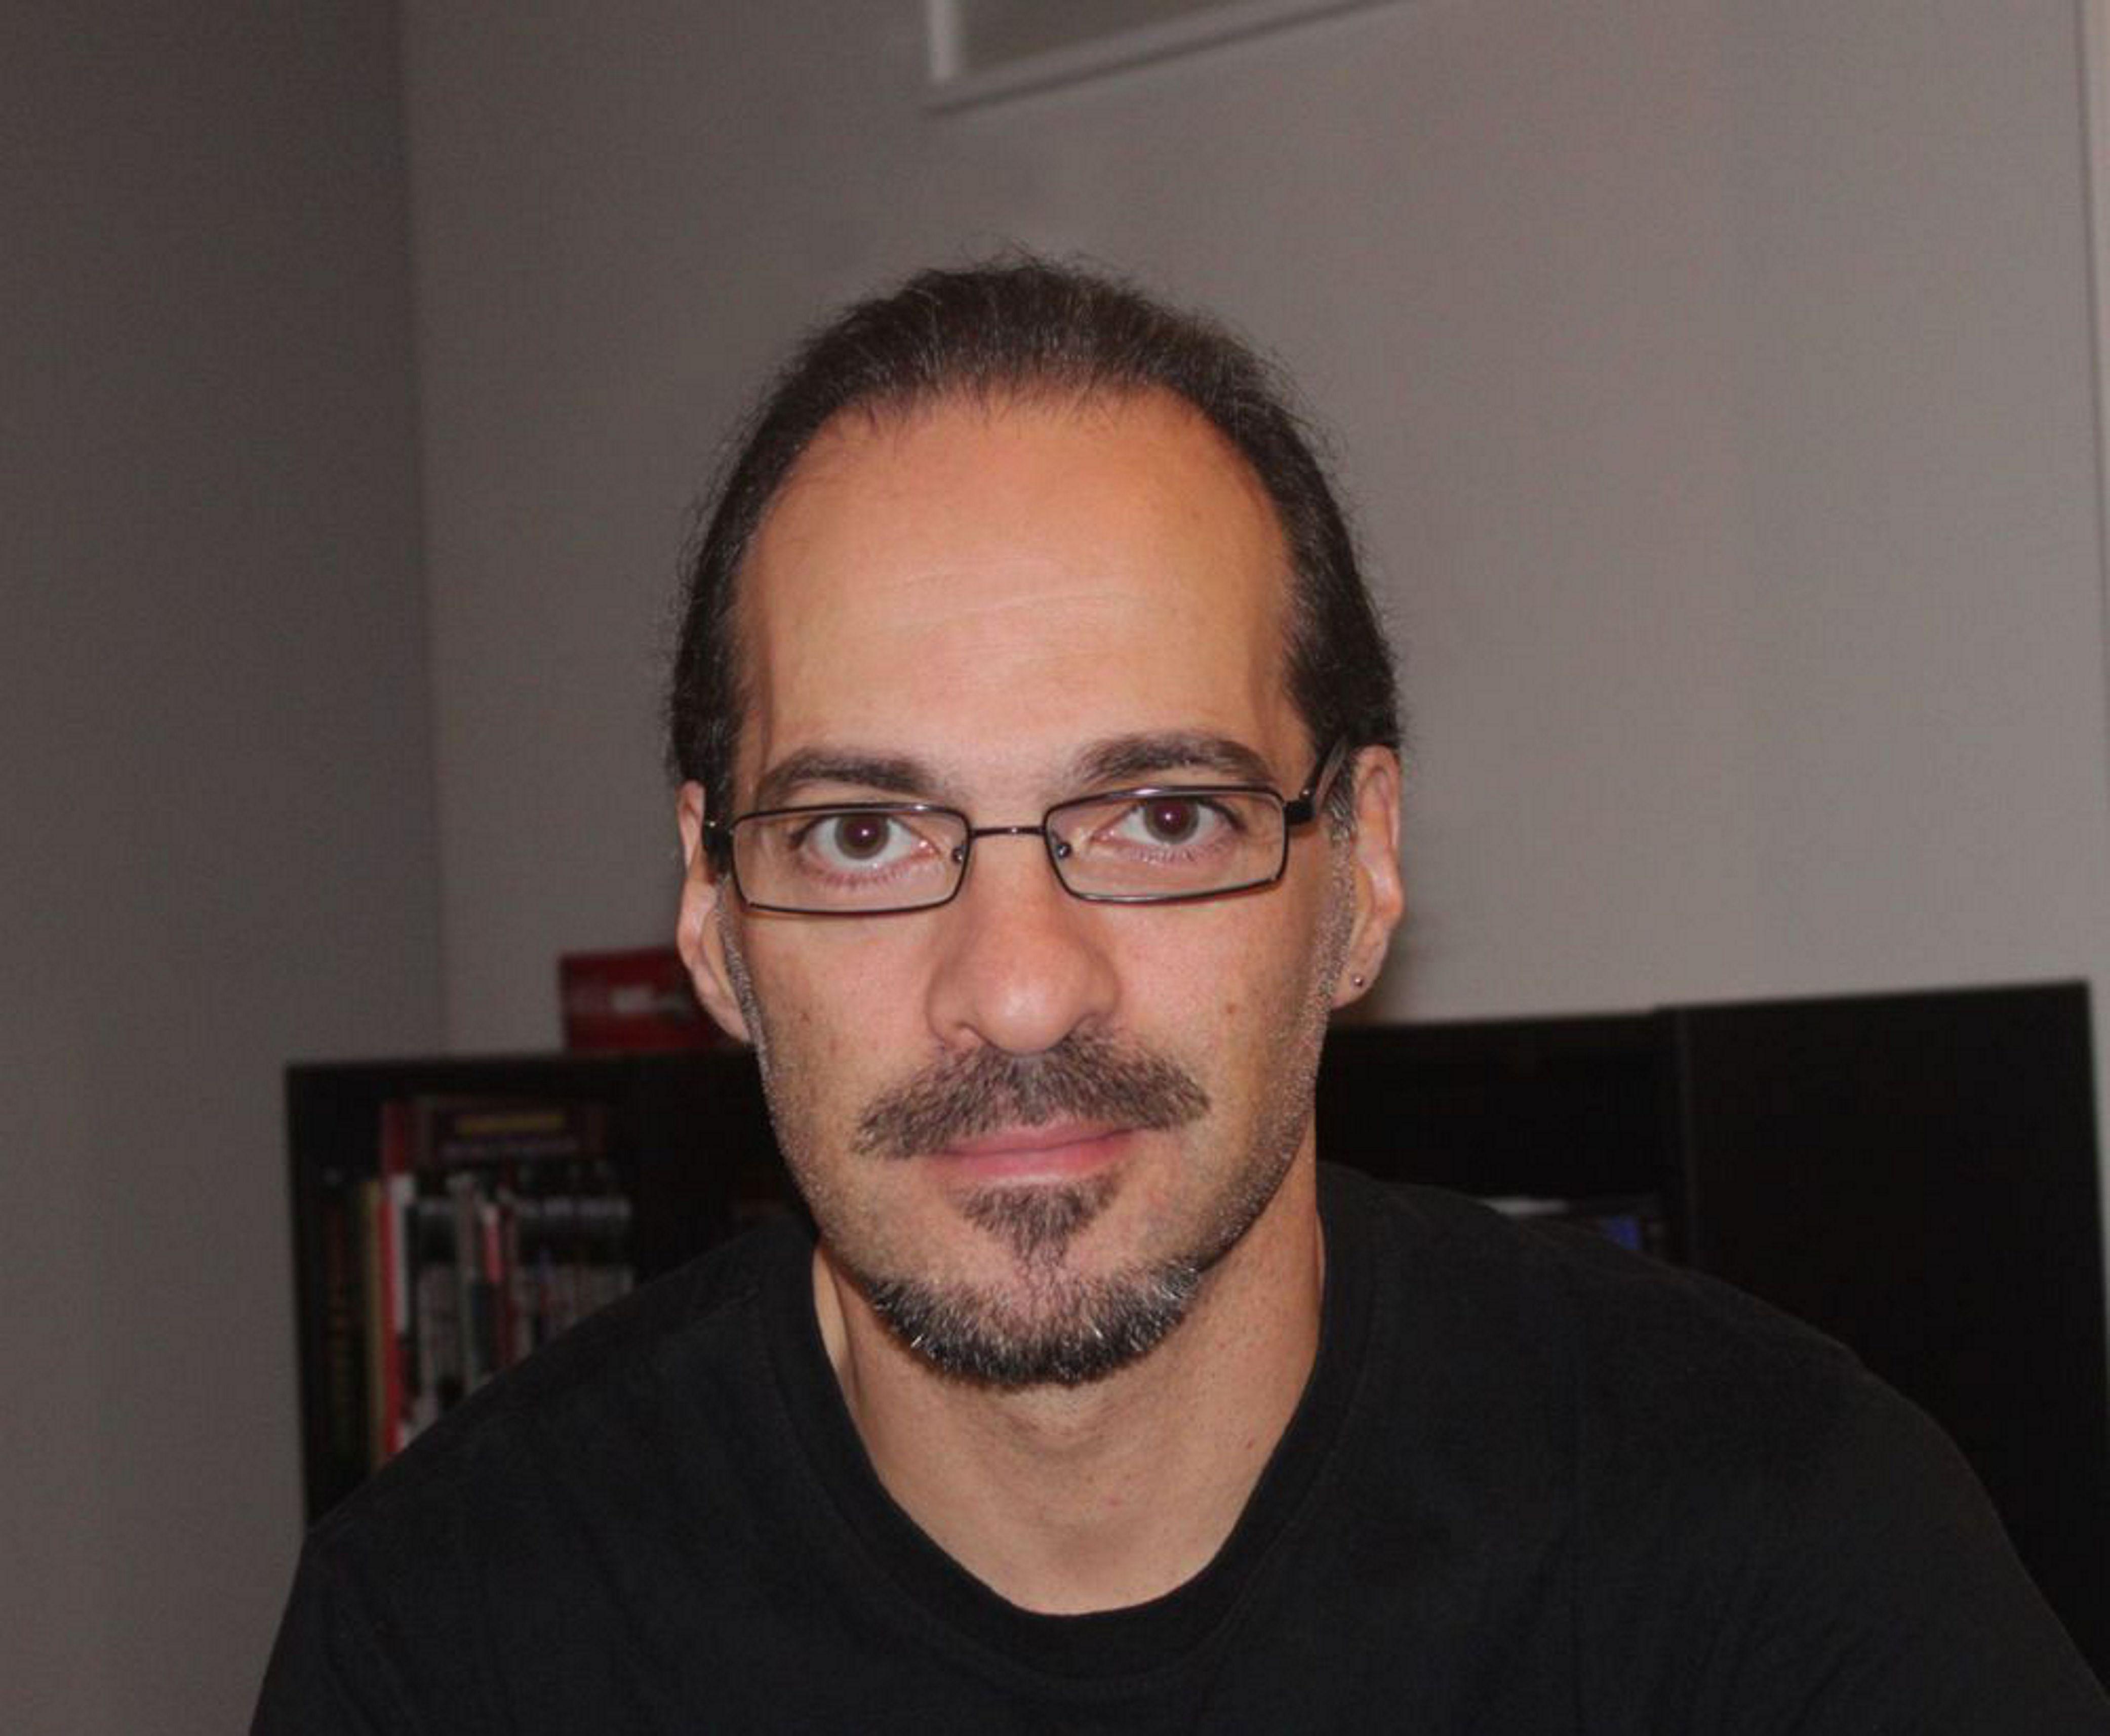 Nuno Lopes Tavares